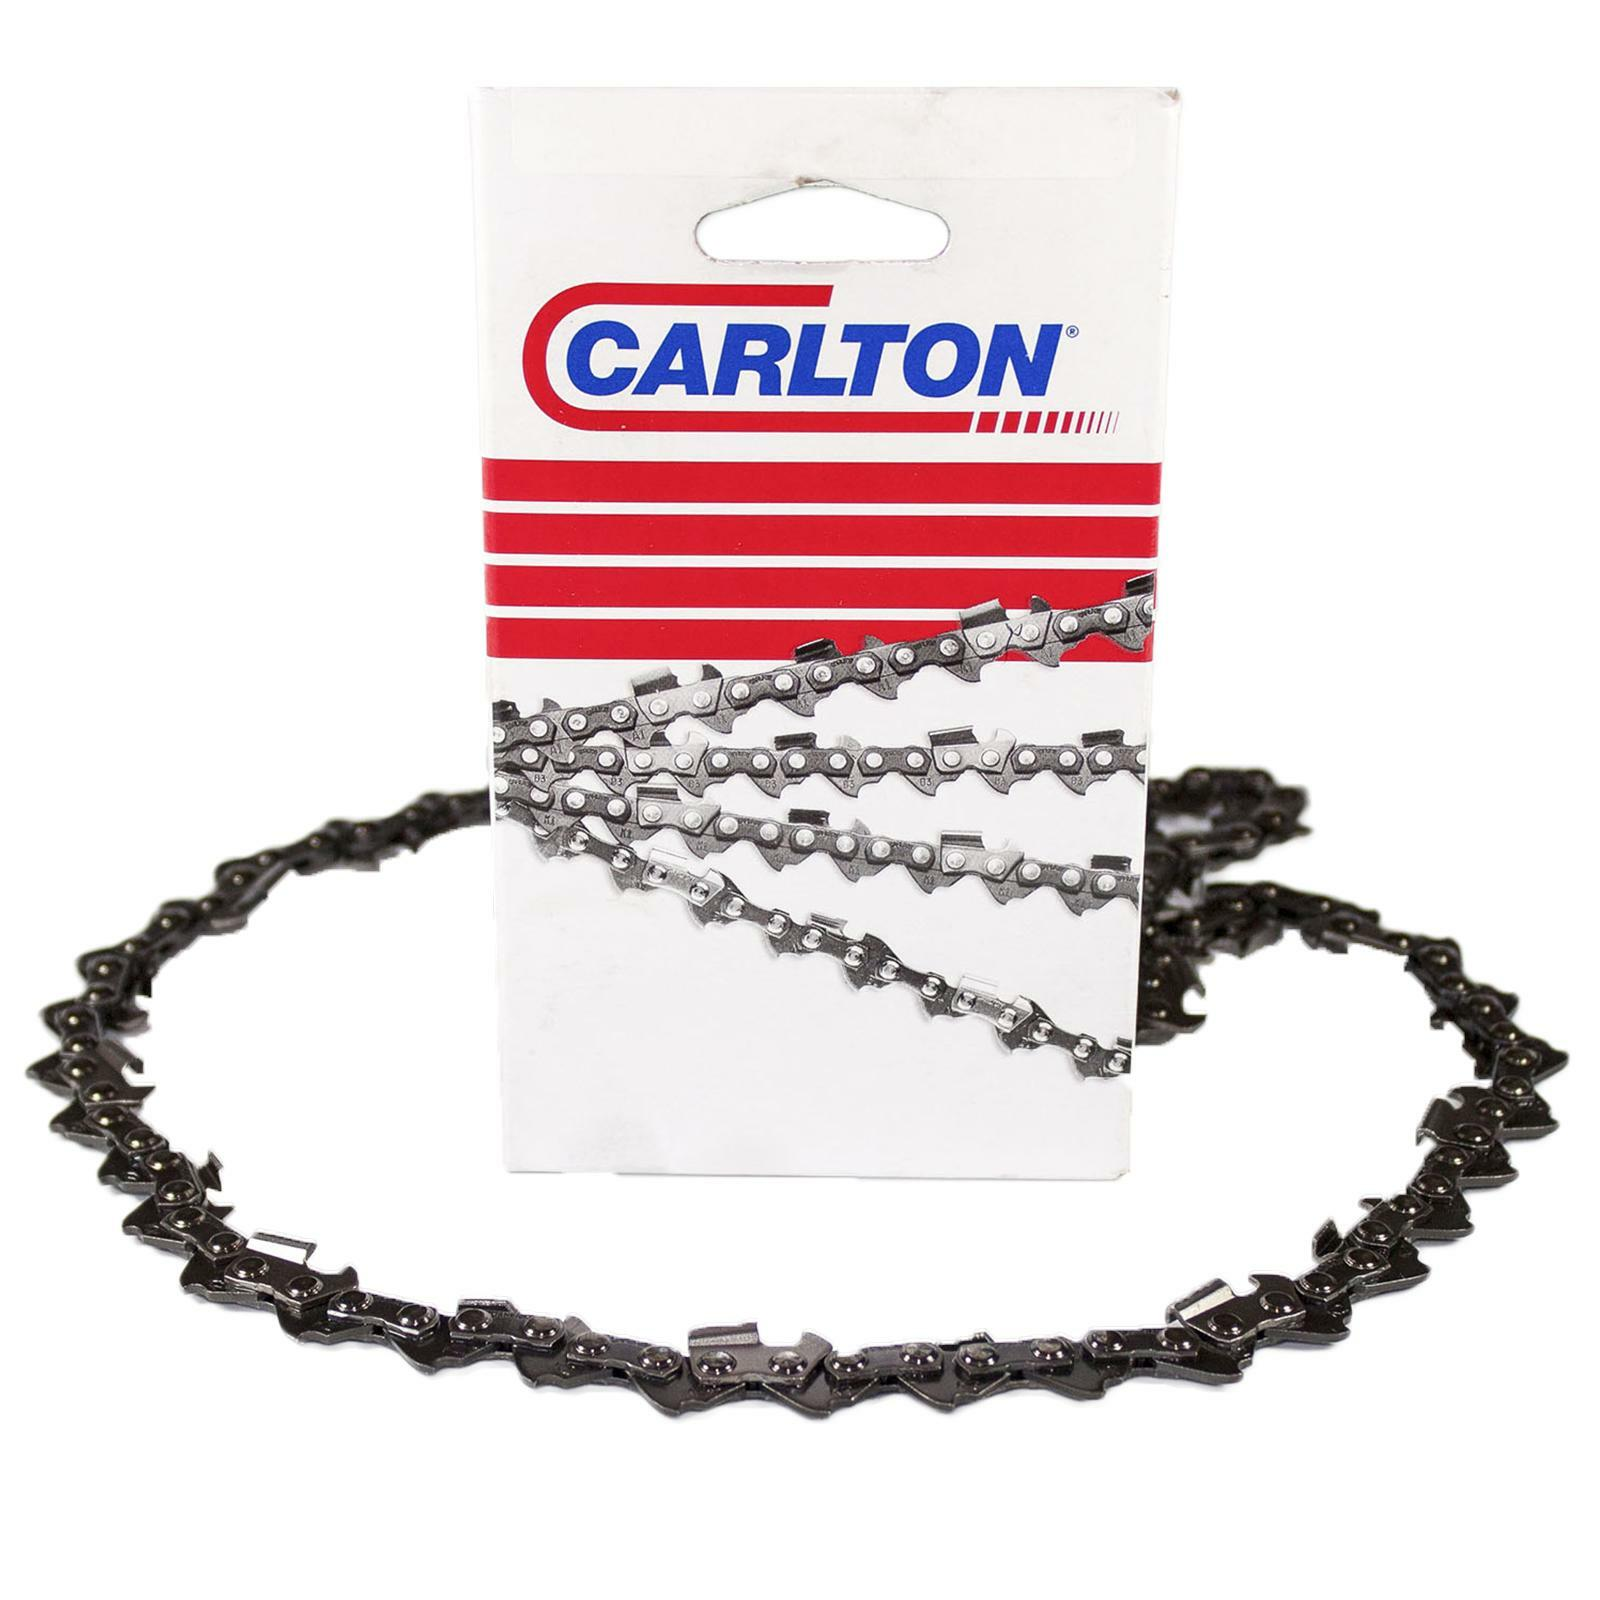 carlton catena per motosega carlton 3/8 sp 1.3 cm 35 53 maglie